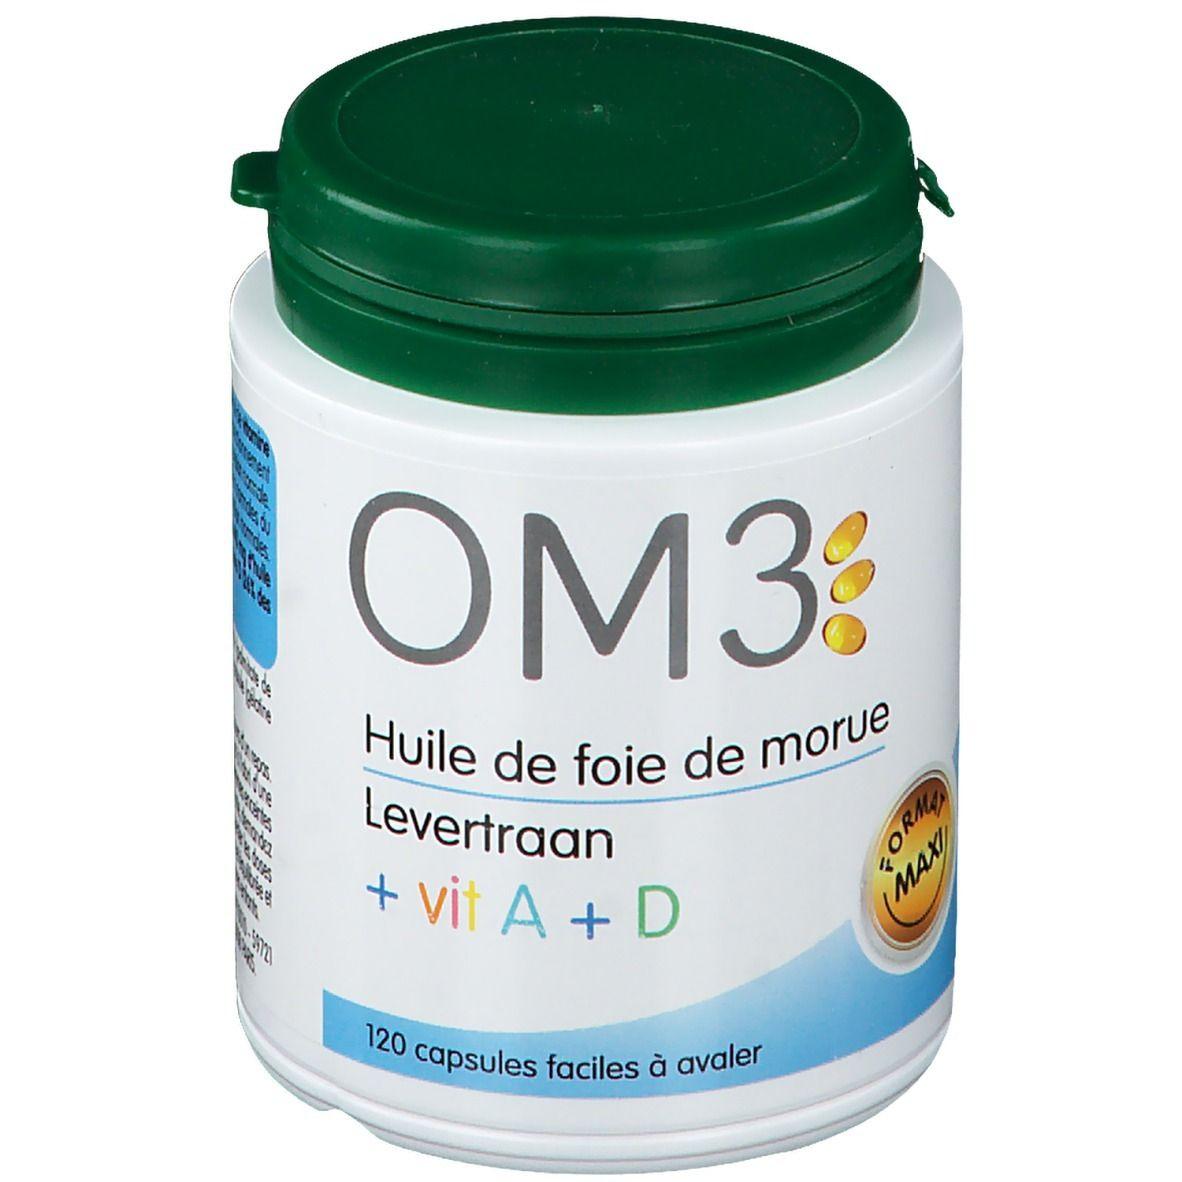 OM3 Huile de Foie de Morue Vit A+D, Capsule pc(s) capsule(s)